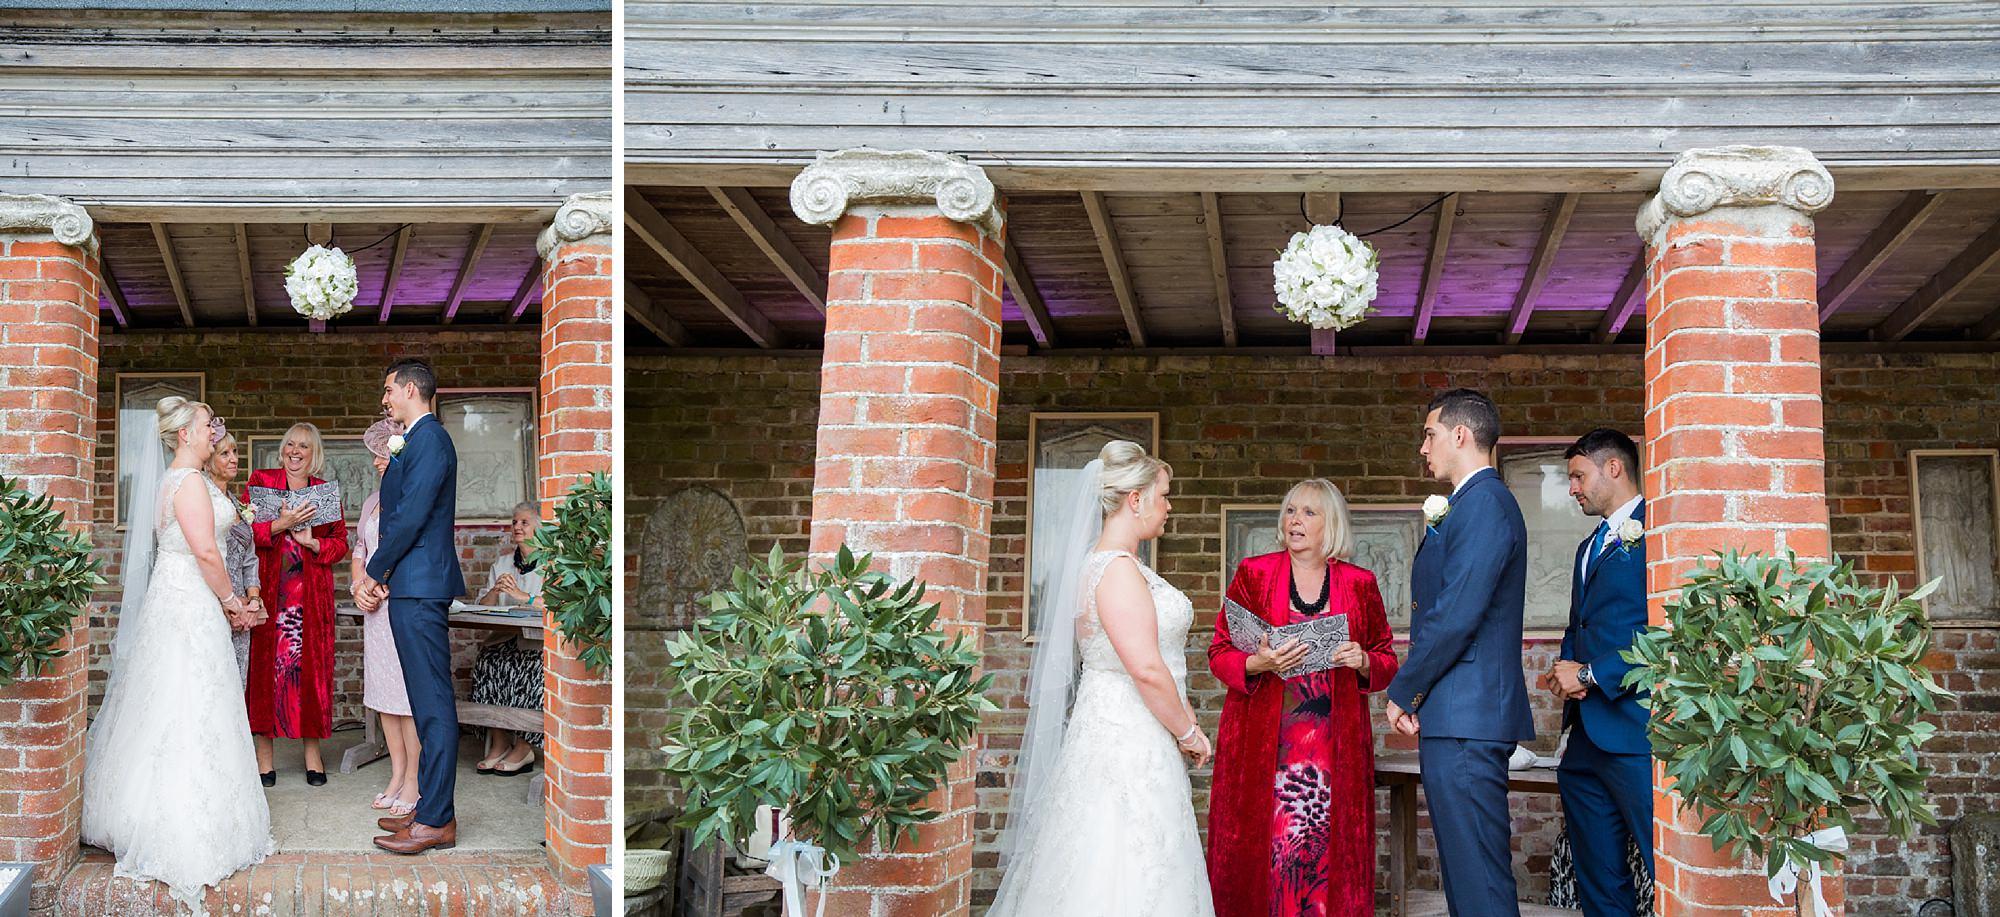 Bignor Park wedding photography exchange of rings